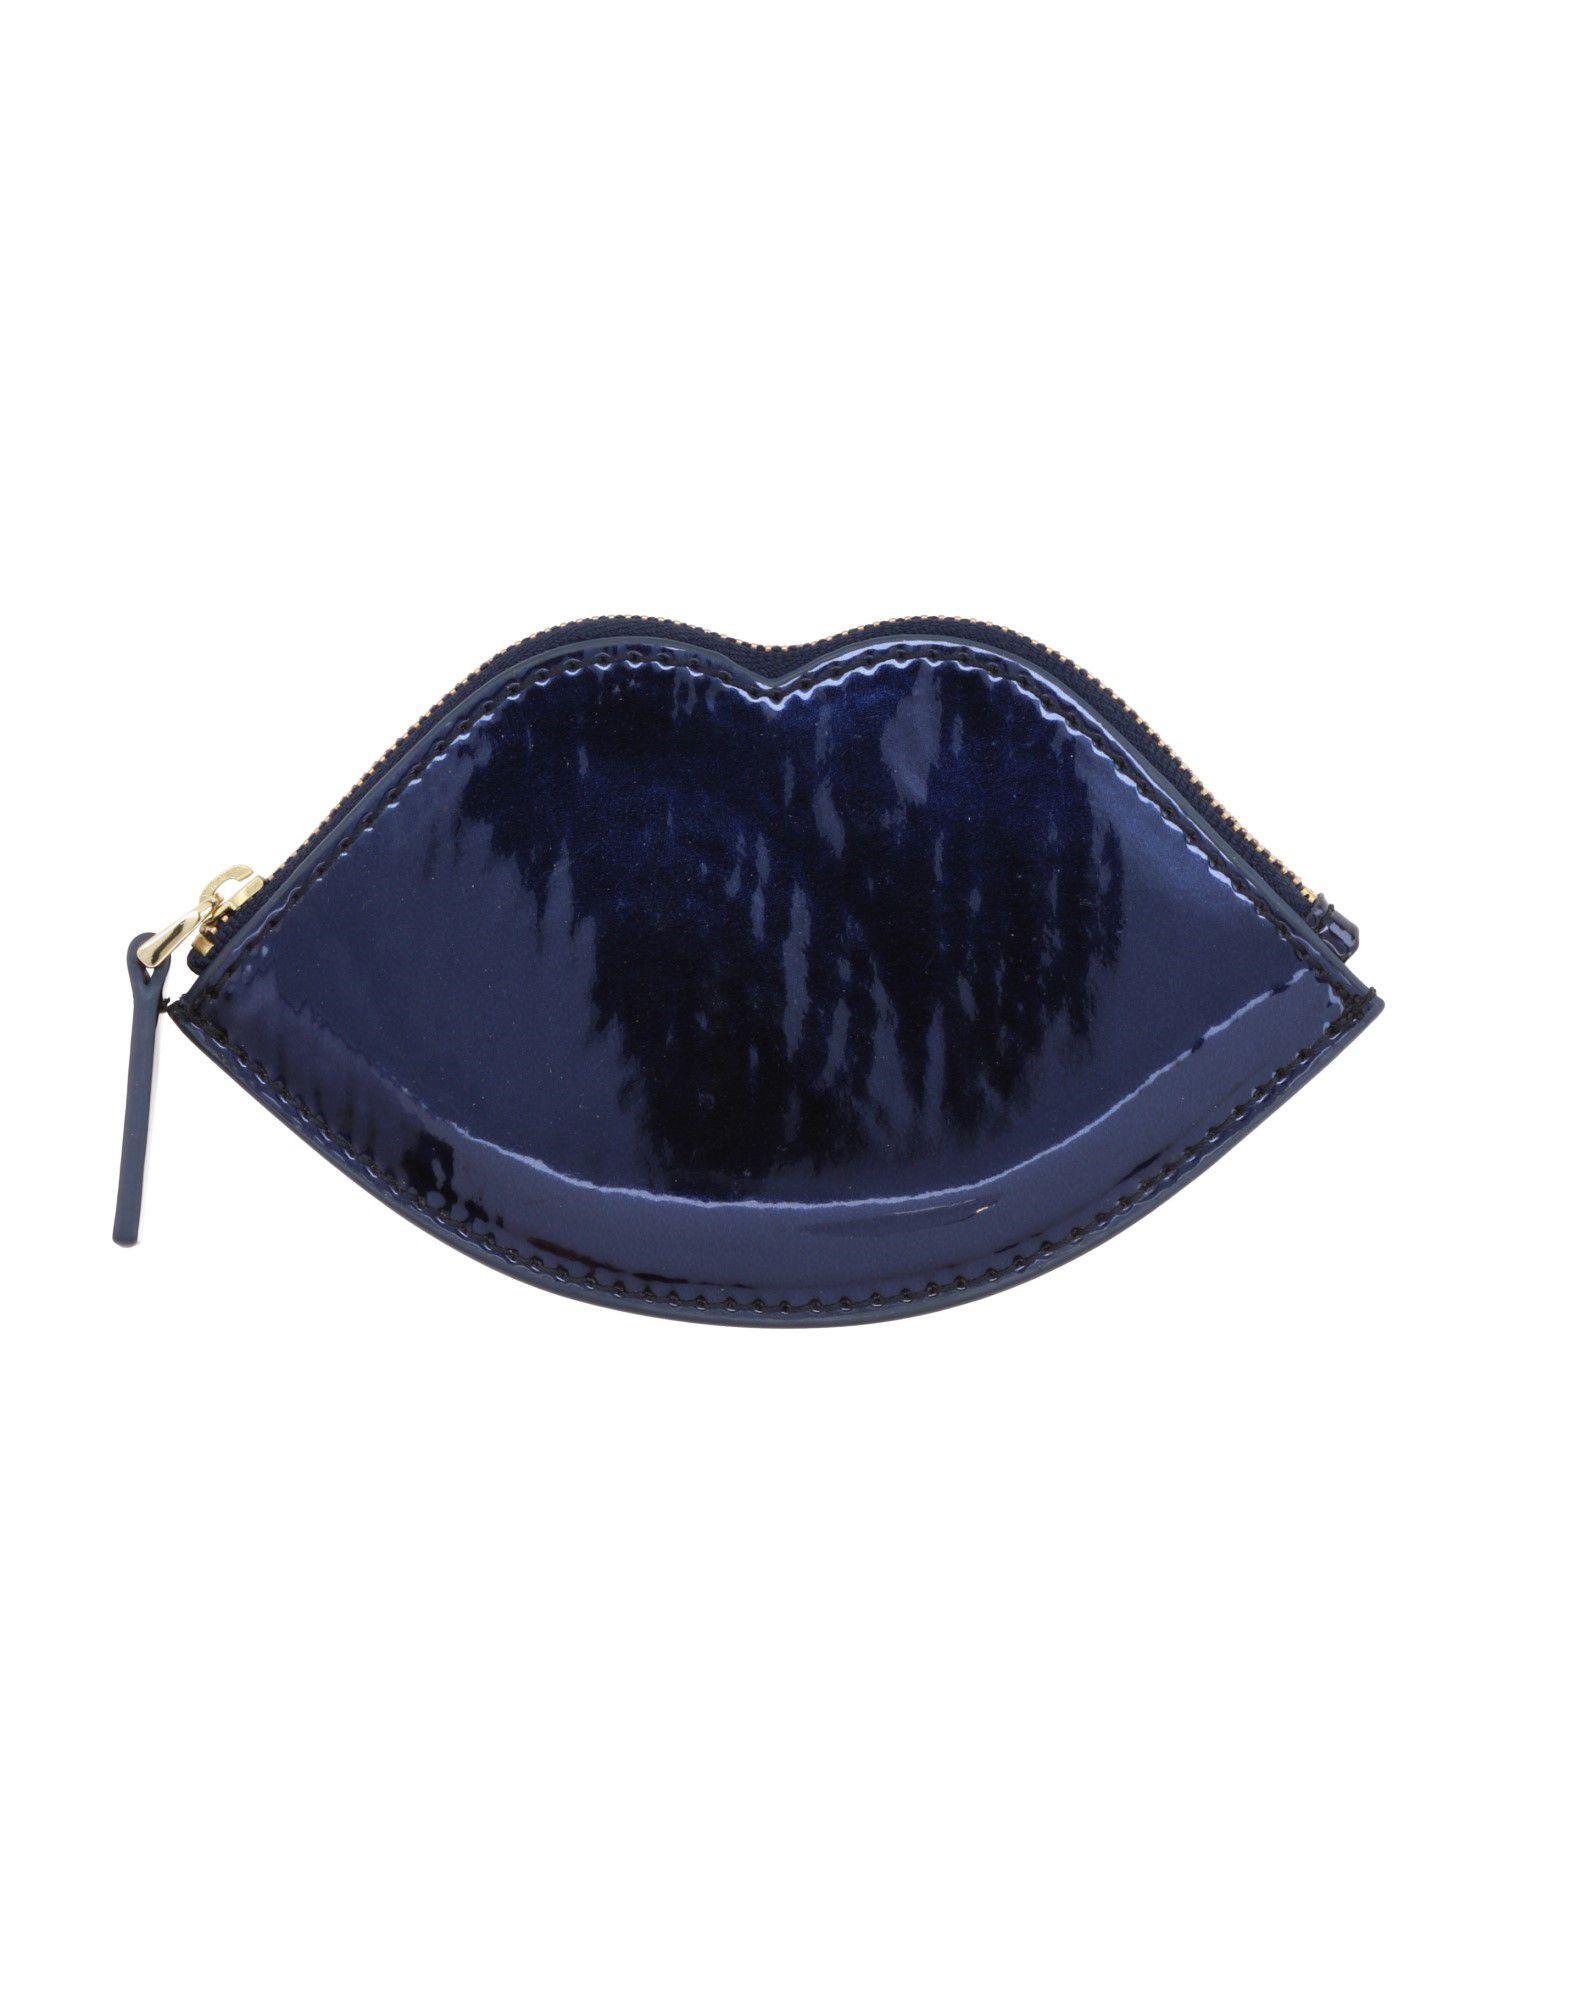 LULU GUINNESS Damen Portemonnaie Farbe Blau Größe 1